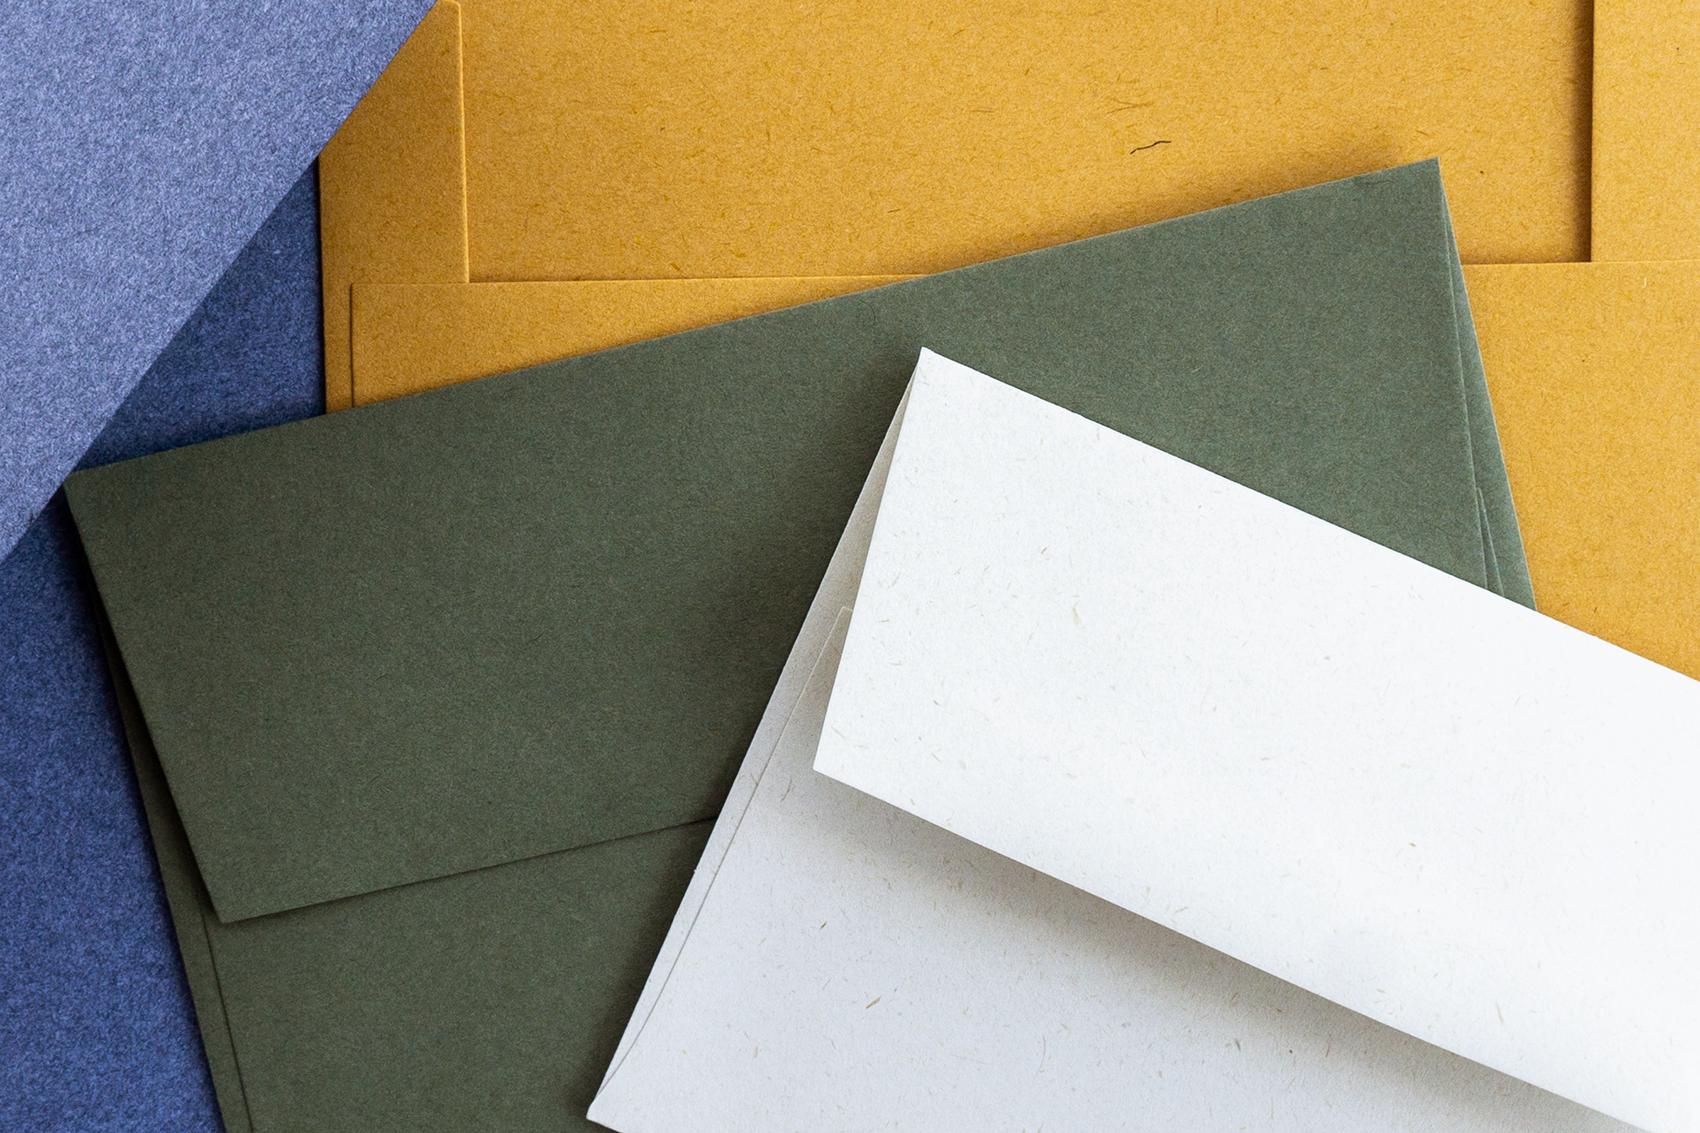 MOH_Website_RenewalSmallPacks_Envelopes.png